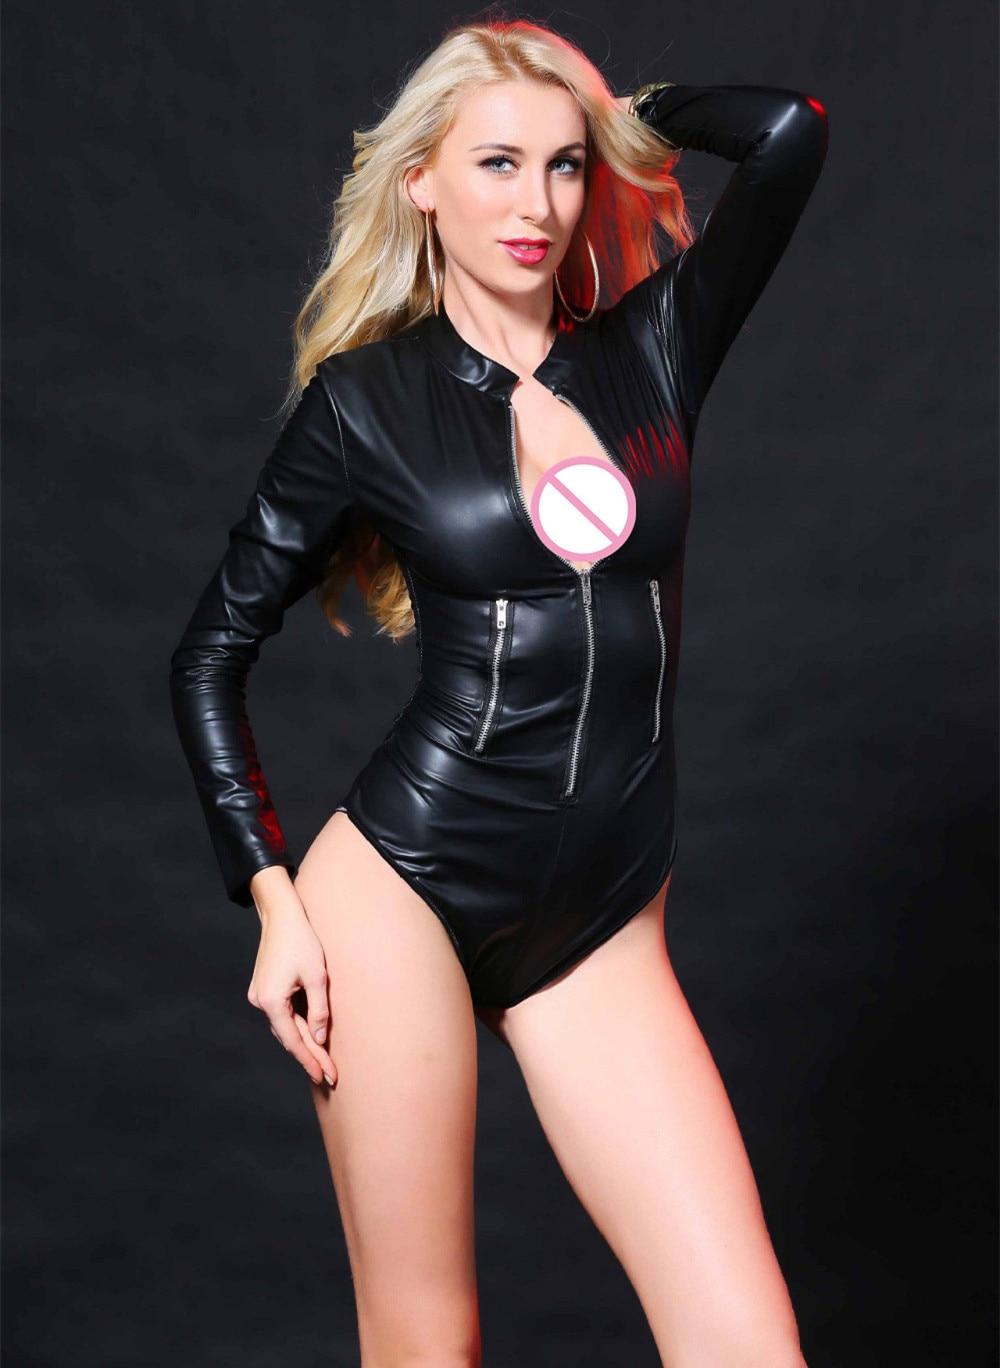 Black Leather Lingerie Sexy Front Zipper BodySuits PVC Erotic Costumes Latex Catsuit Sexy Women Clubwear M-XXL